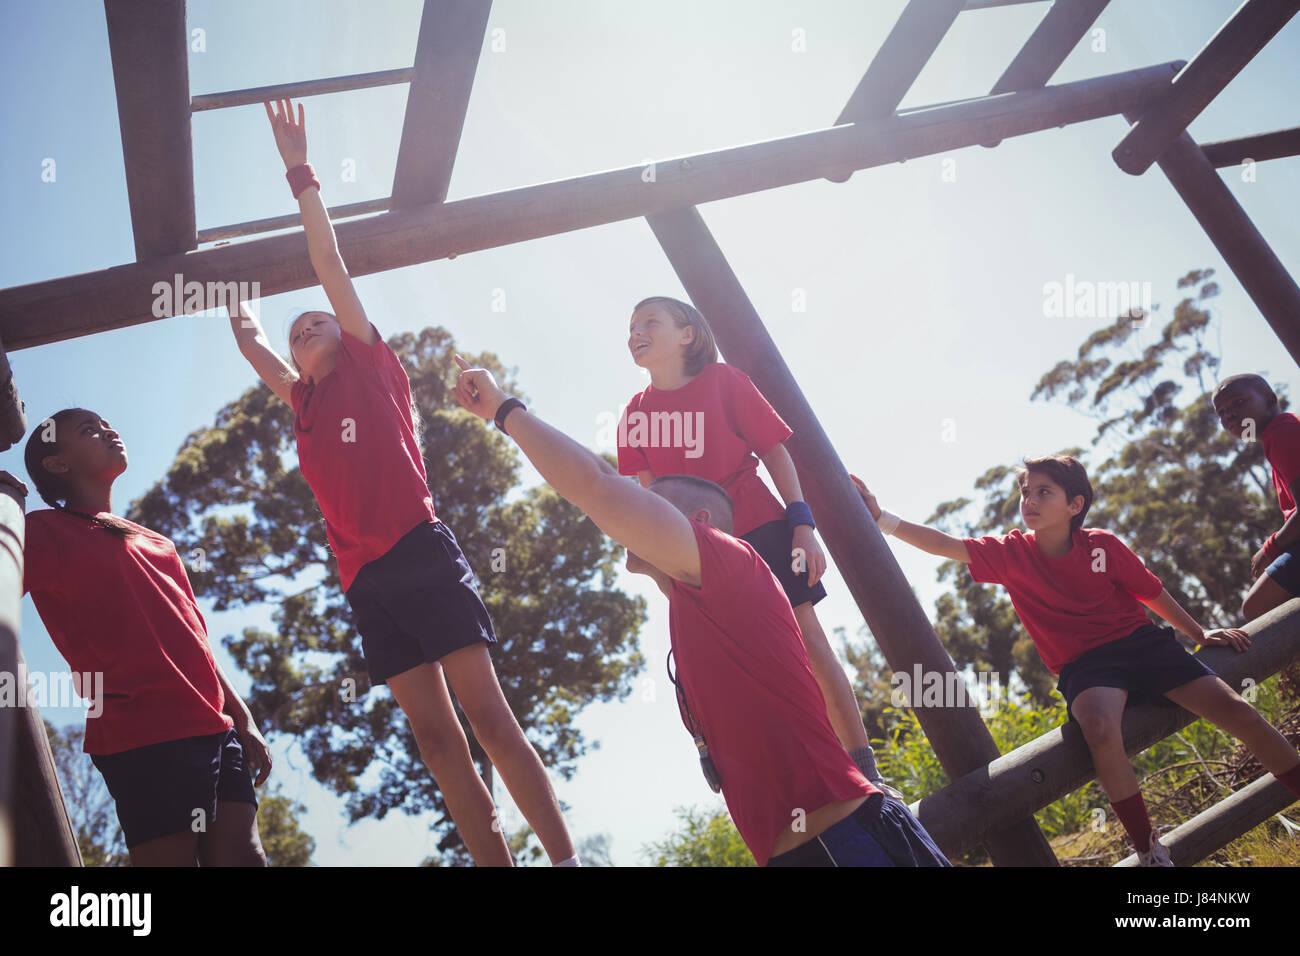 Klettergerüst Boot : Kinder klettern klettergerüst beim hindernis parcours training im